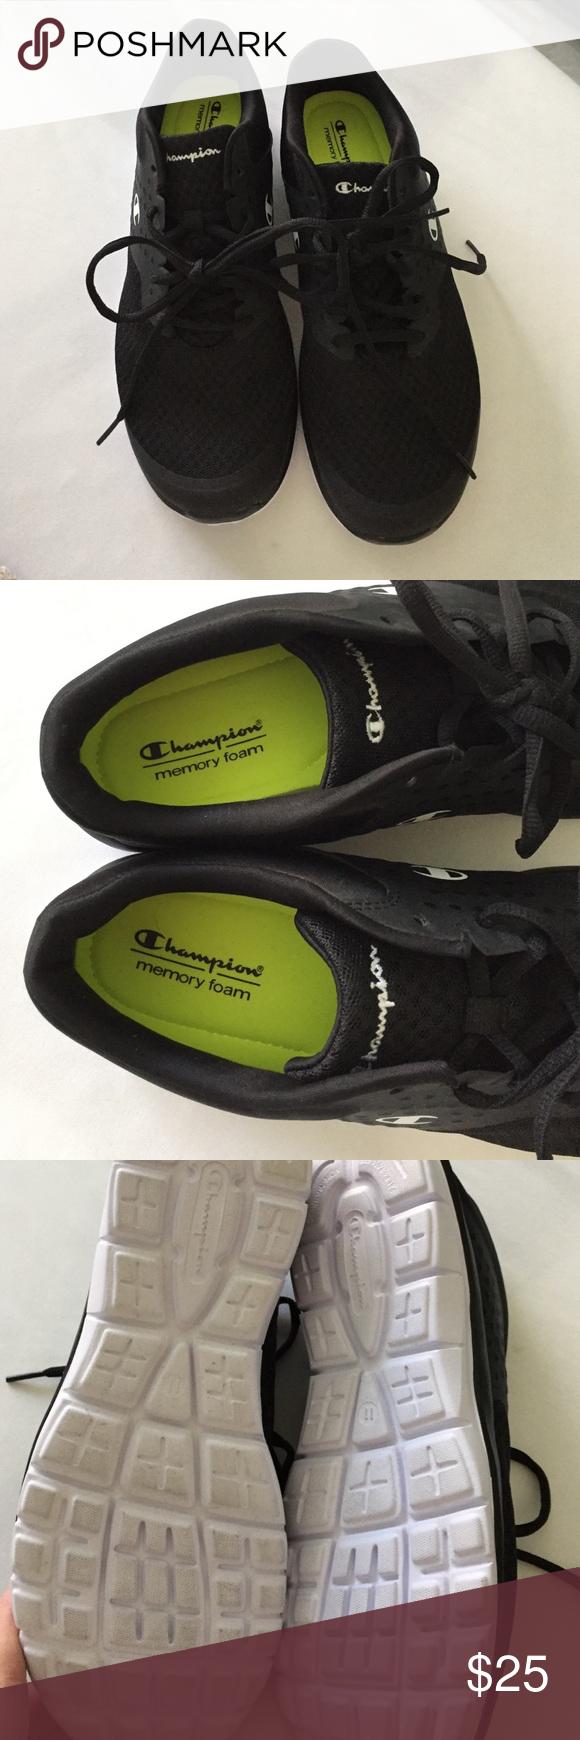 8b714fec2 NWOT size 11 champion sneakers. Never worn NWOT black champion size 11 sneakers  memory foam insole. Super comfy Champion Shoes Athletic Shoes